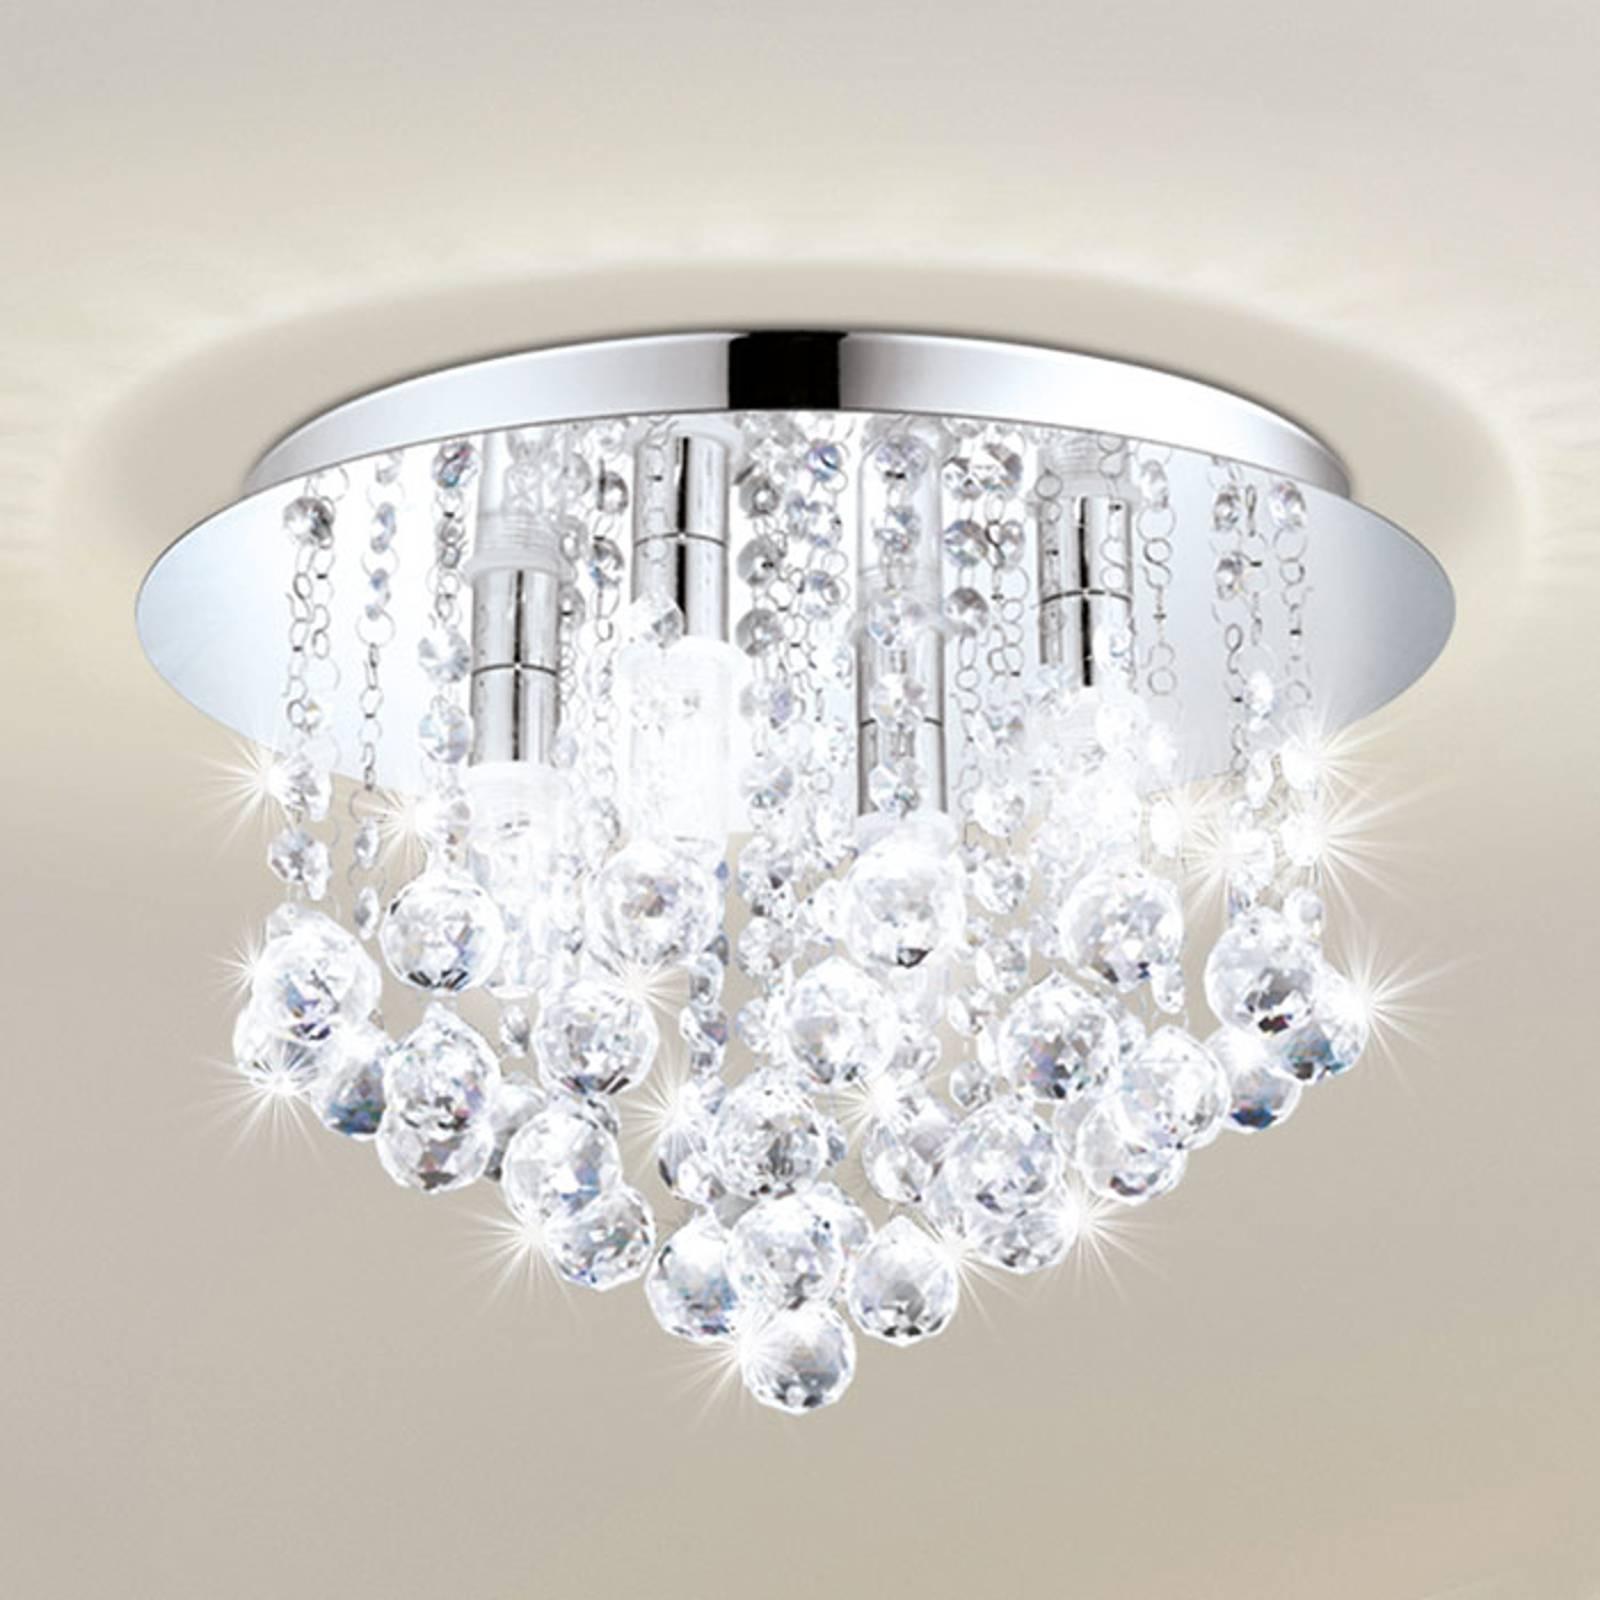 LED-kattovalaisin Almonte koristein, 50cm